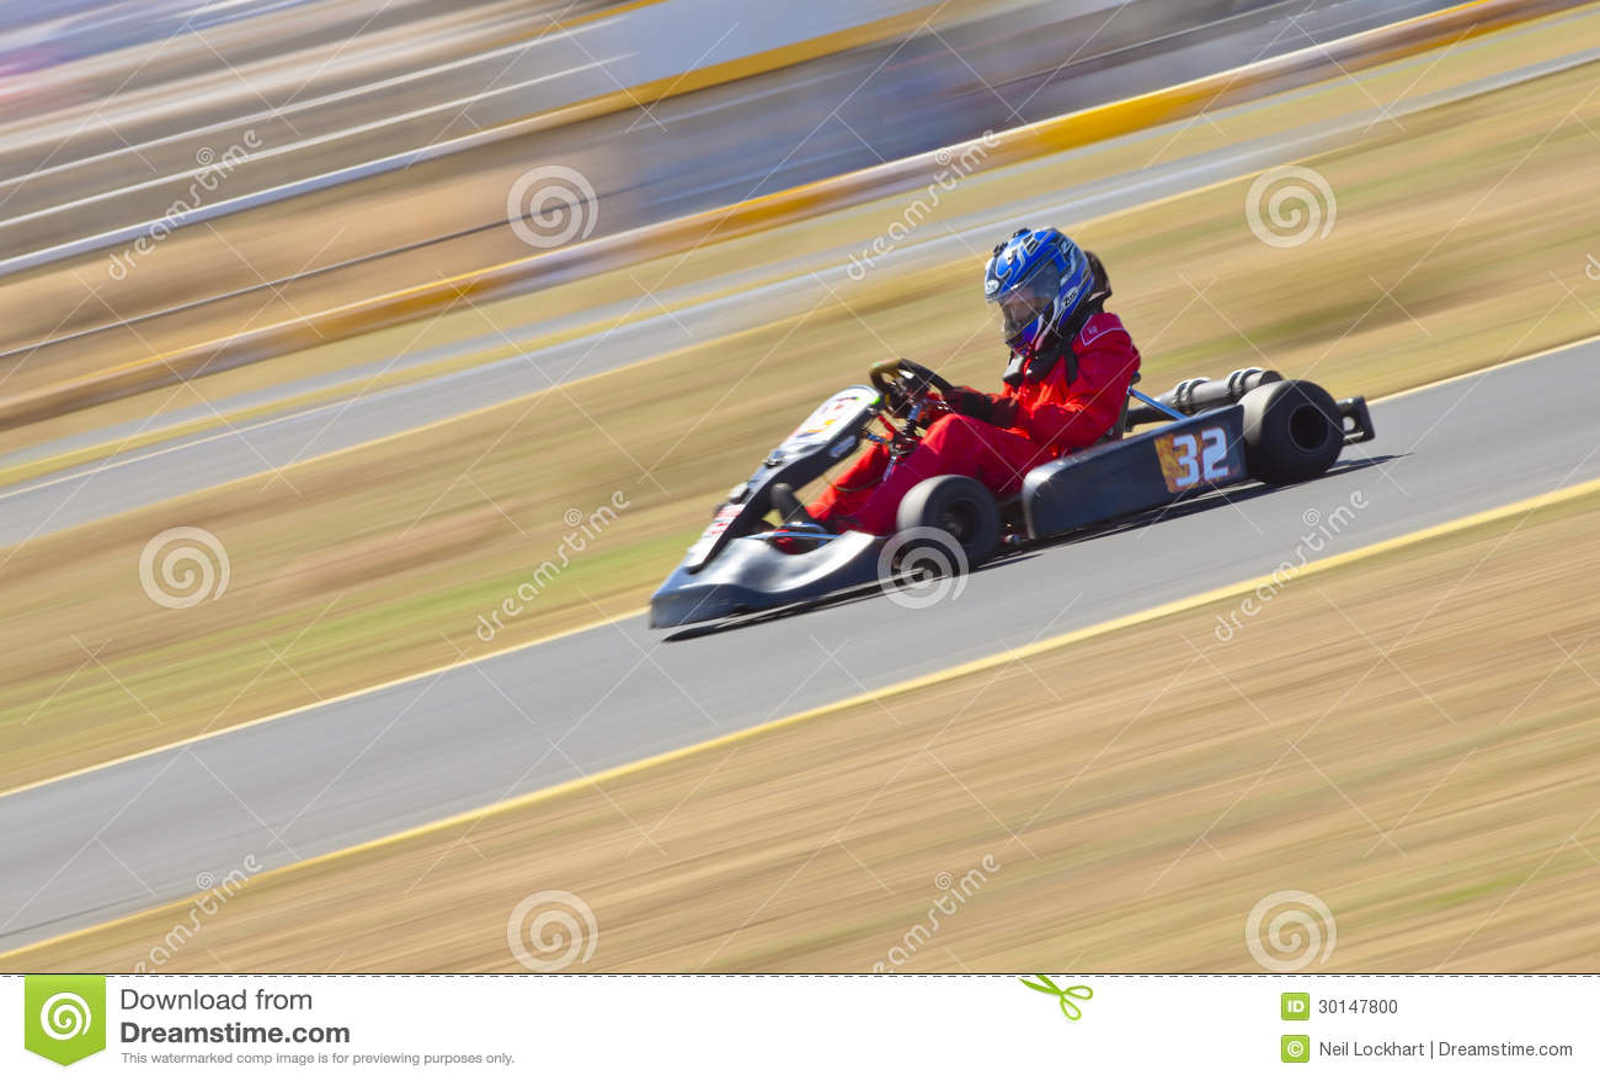 Go Karts Reno >> Kart Racing Reno Go Kart Racing